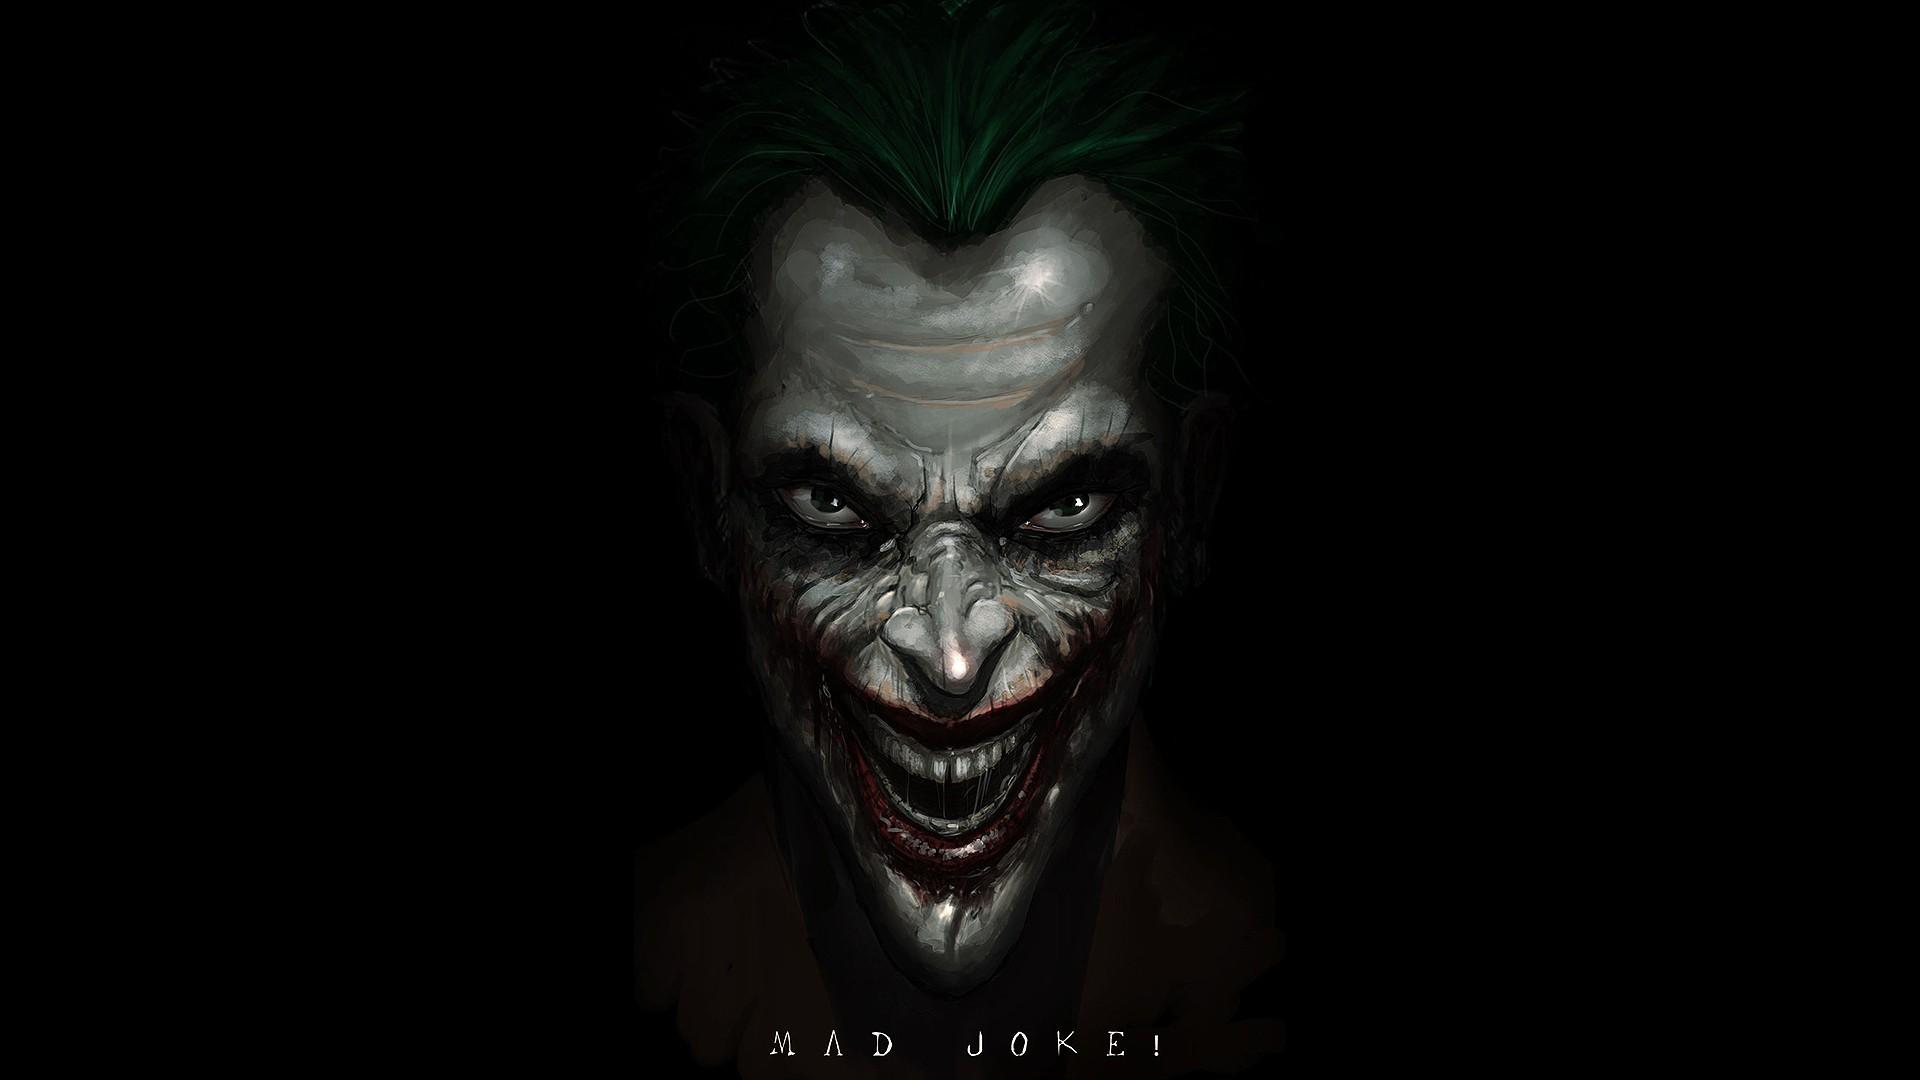 Joker hd wallpaper background image 1920x1080 id for Joker wallpaper 4k